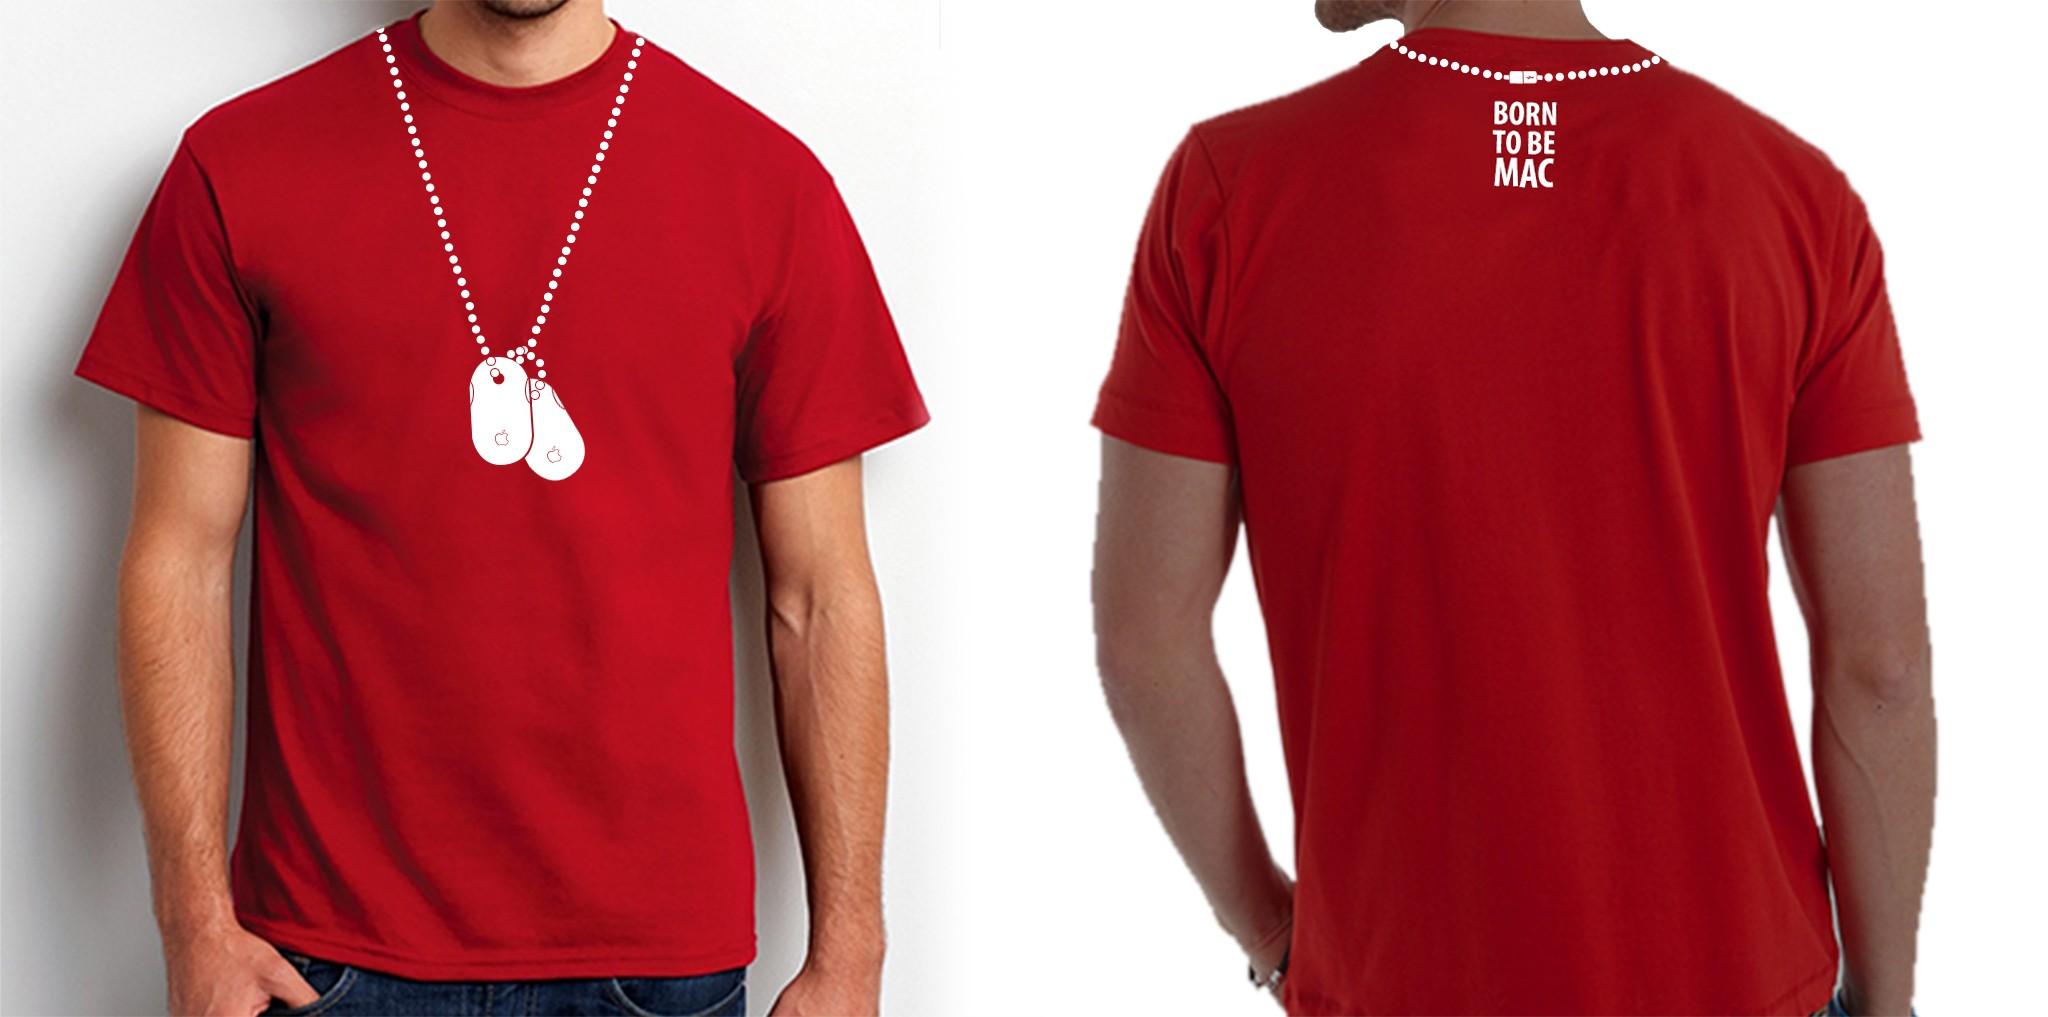 Apple themed T-shirt design